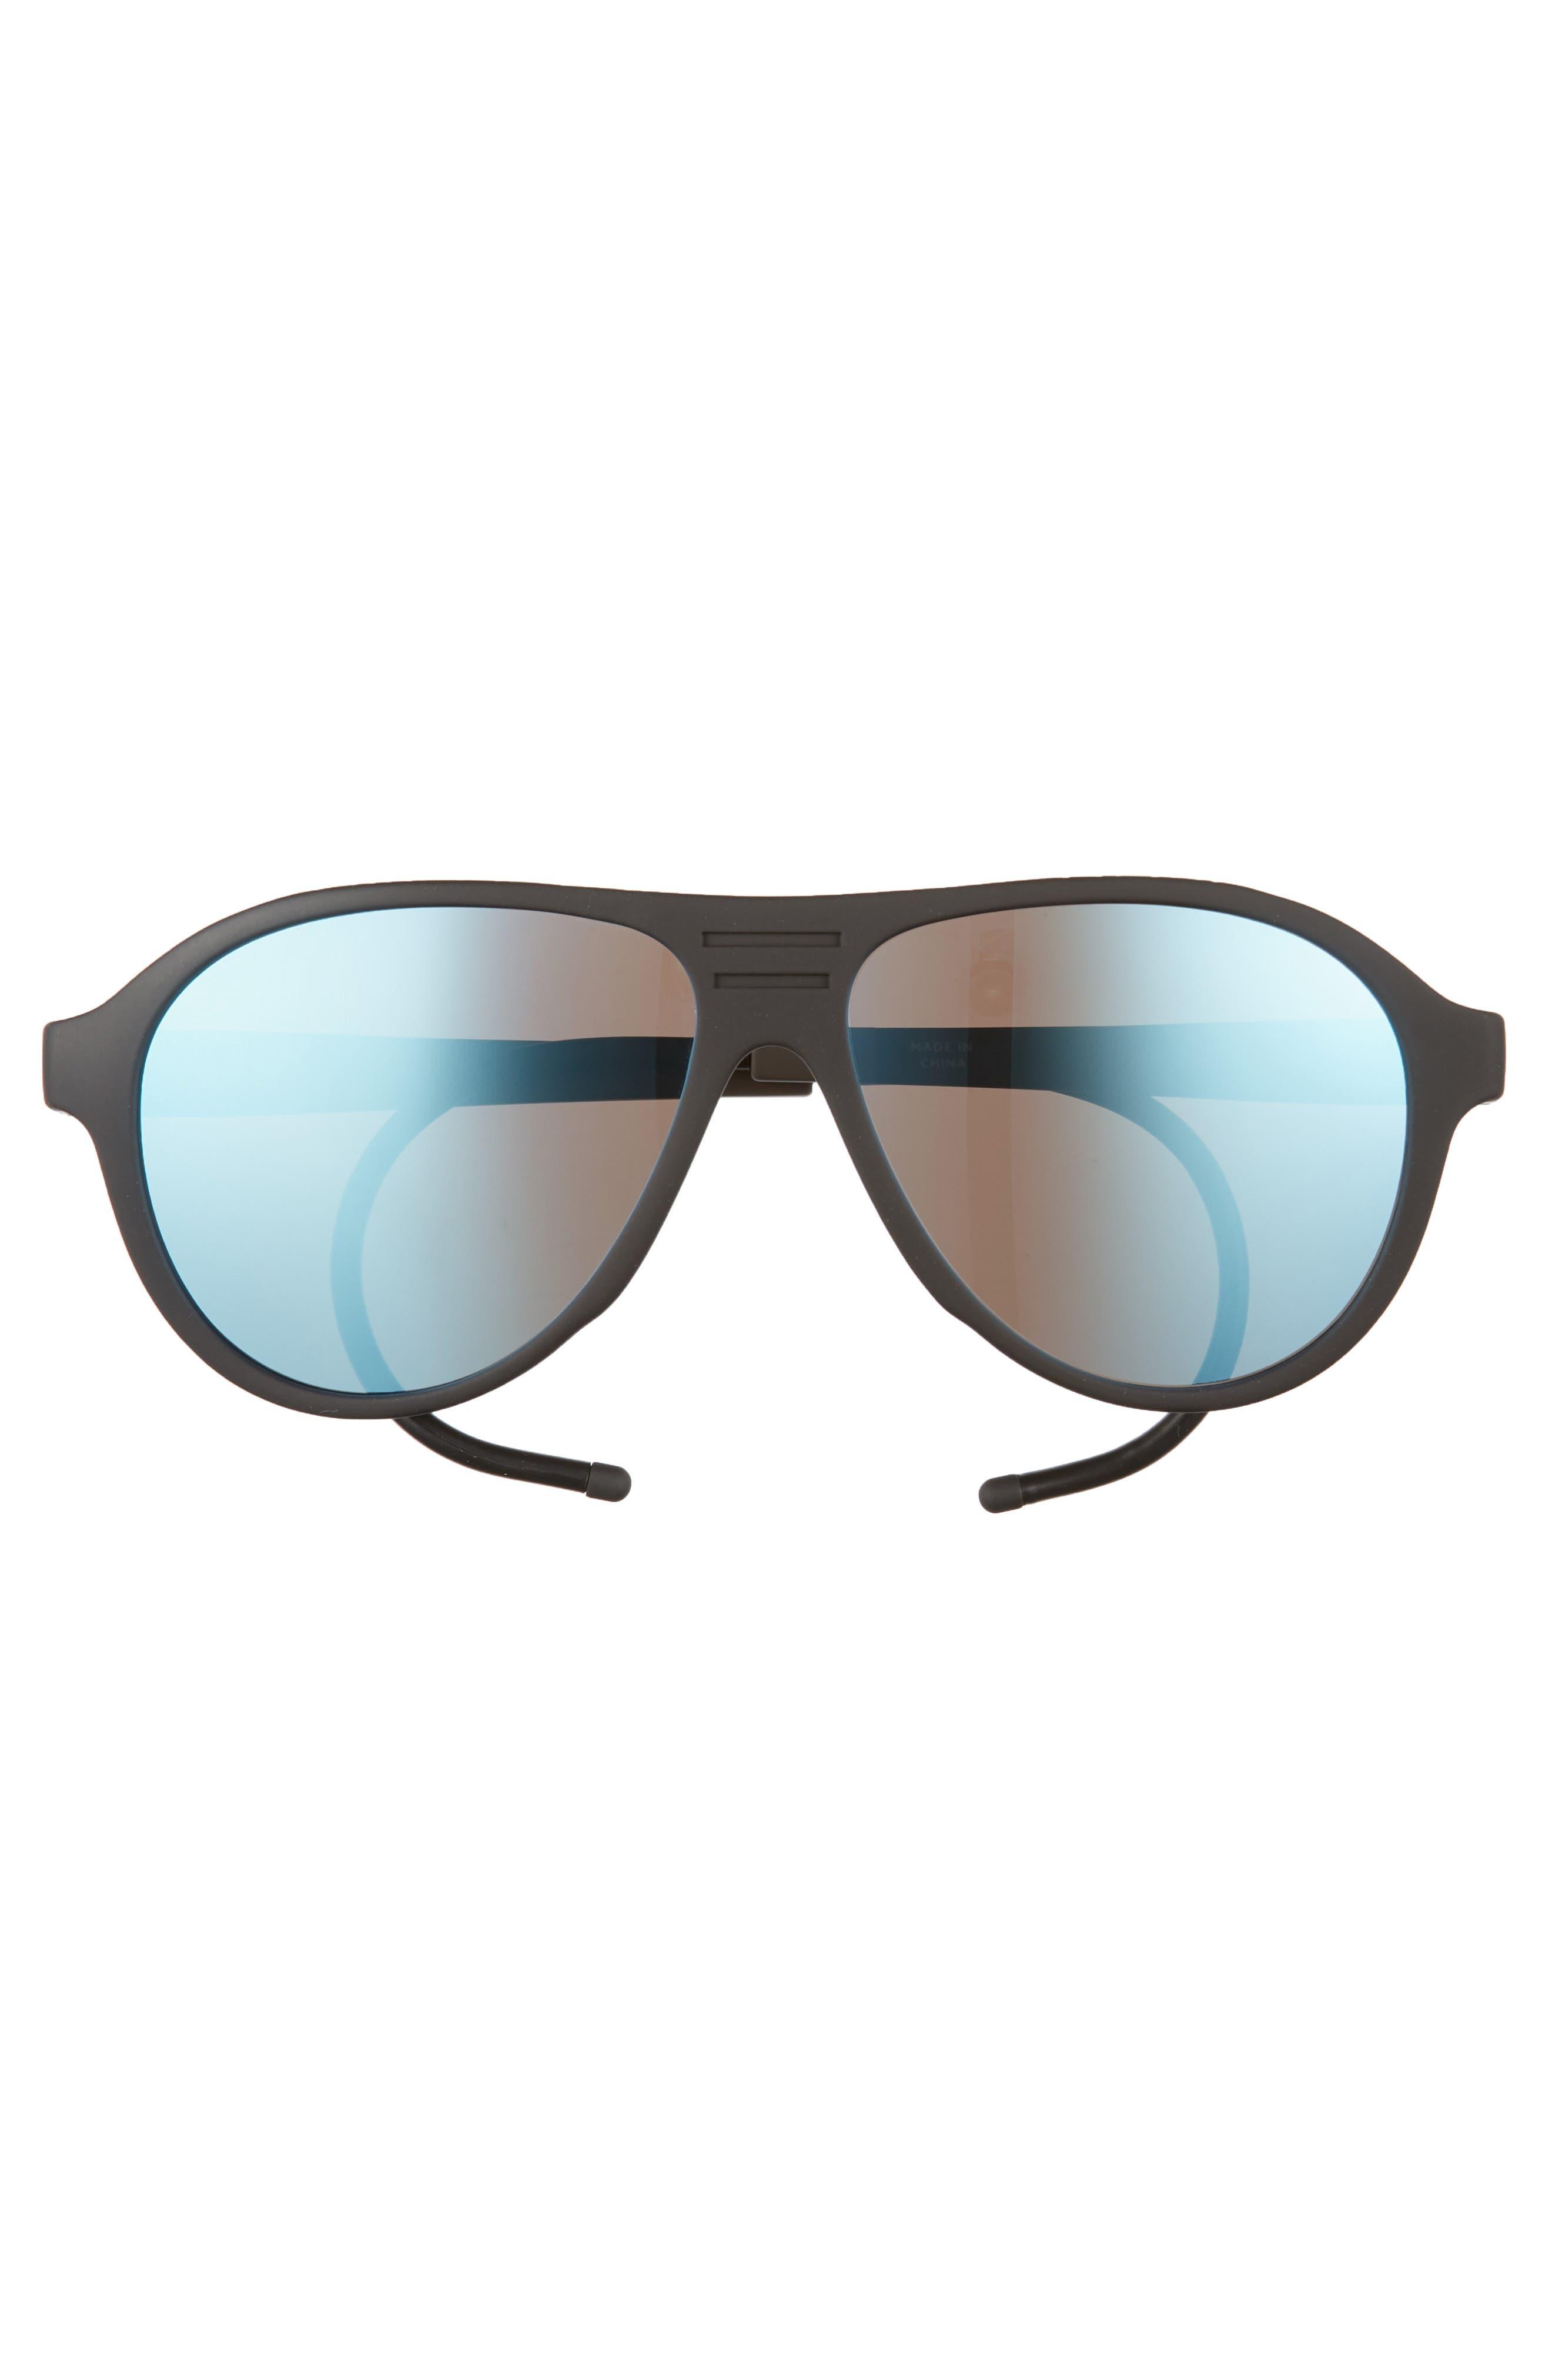 Traveler Zion 58mm Polarized Aviator Sunglasses,                             Alternate thumbnail 2, color,                             Matte Black/ Blue Mirror